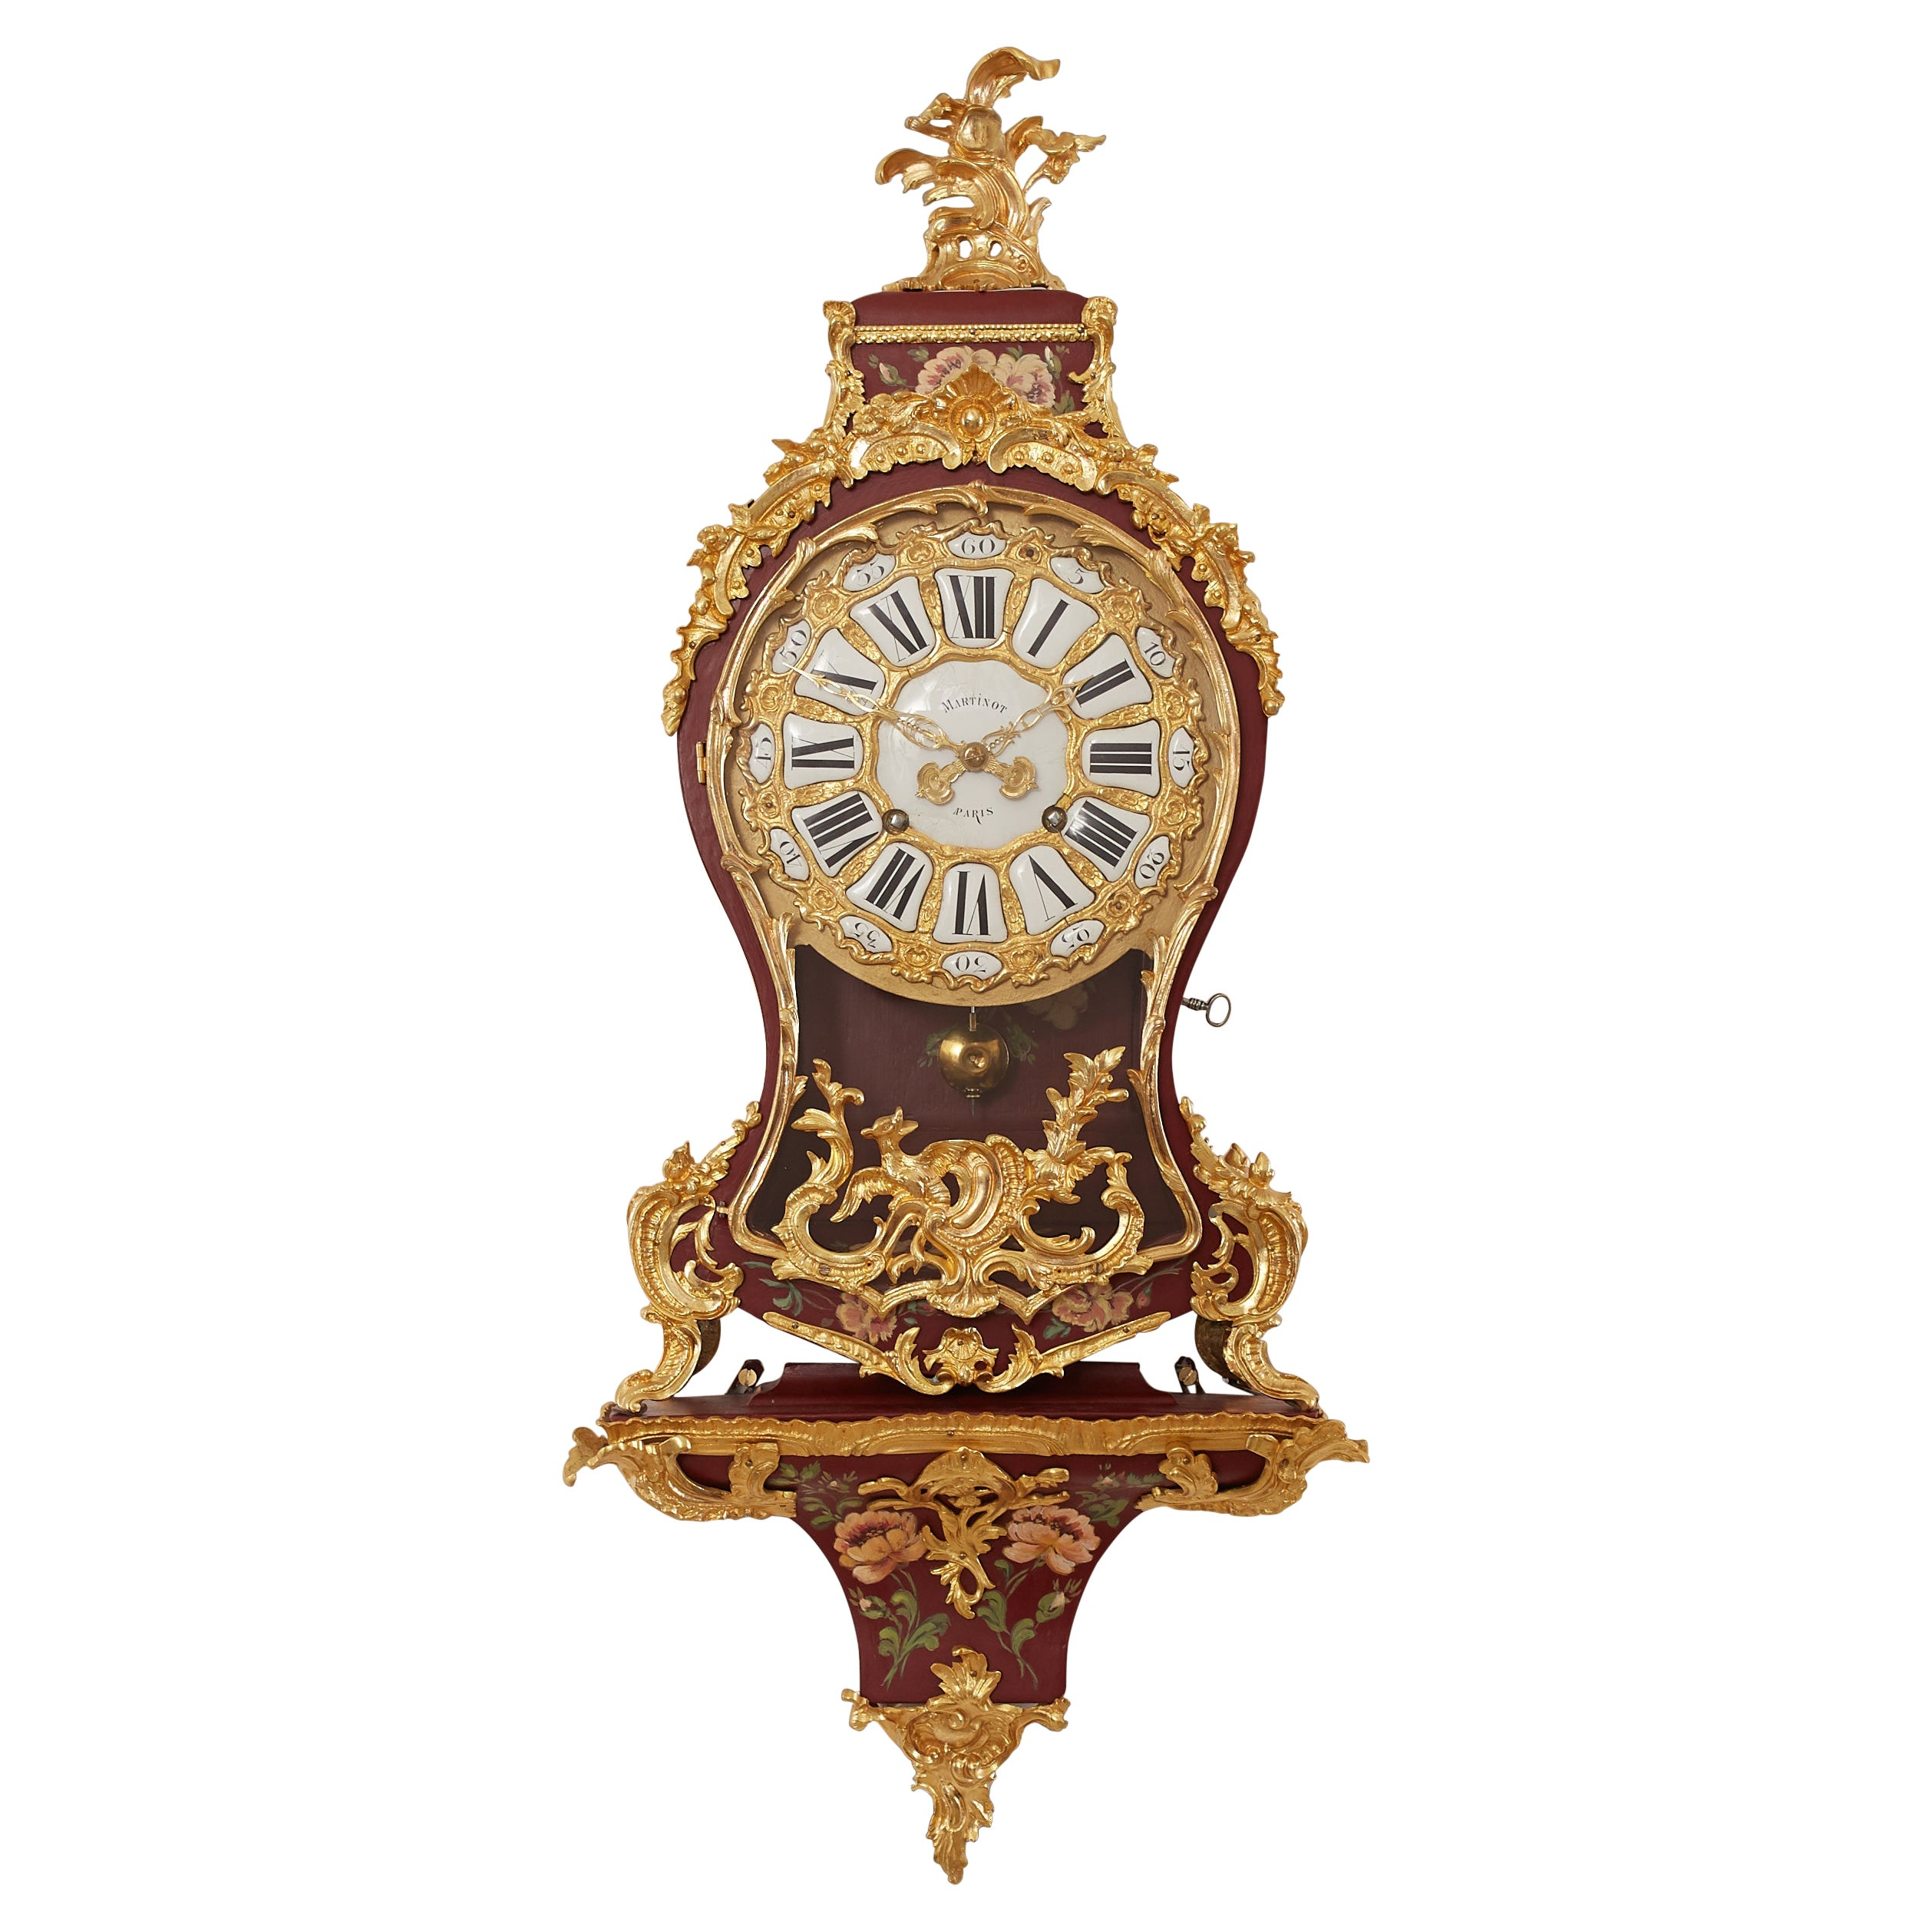 Antique Ormolu French Cartel Clock, Honoring Femininity in Art